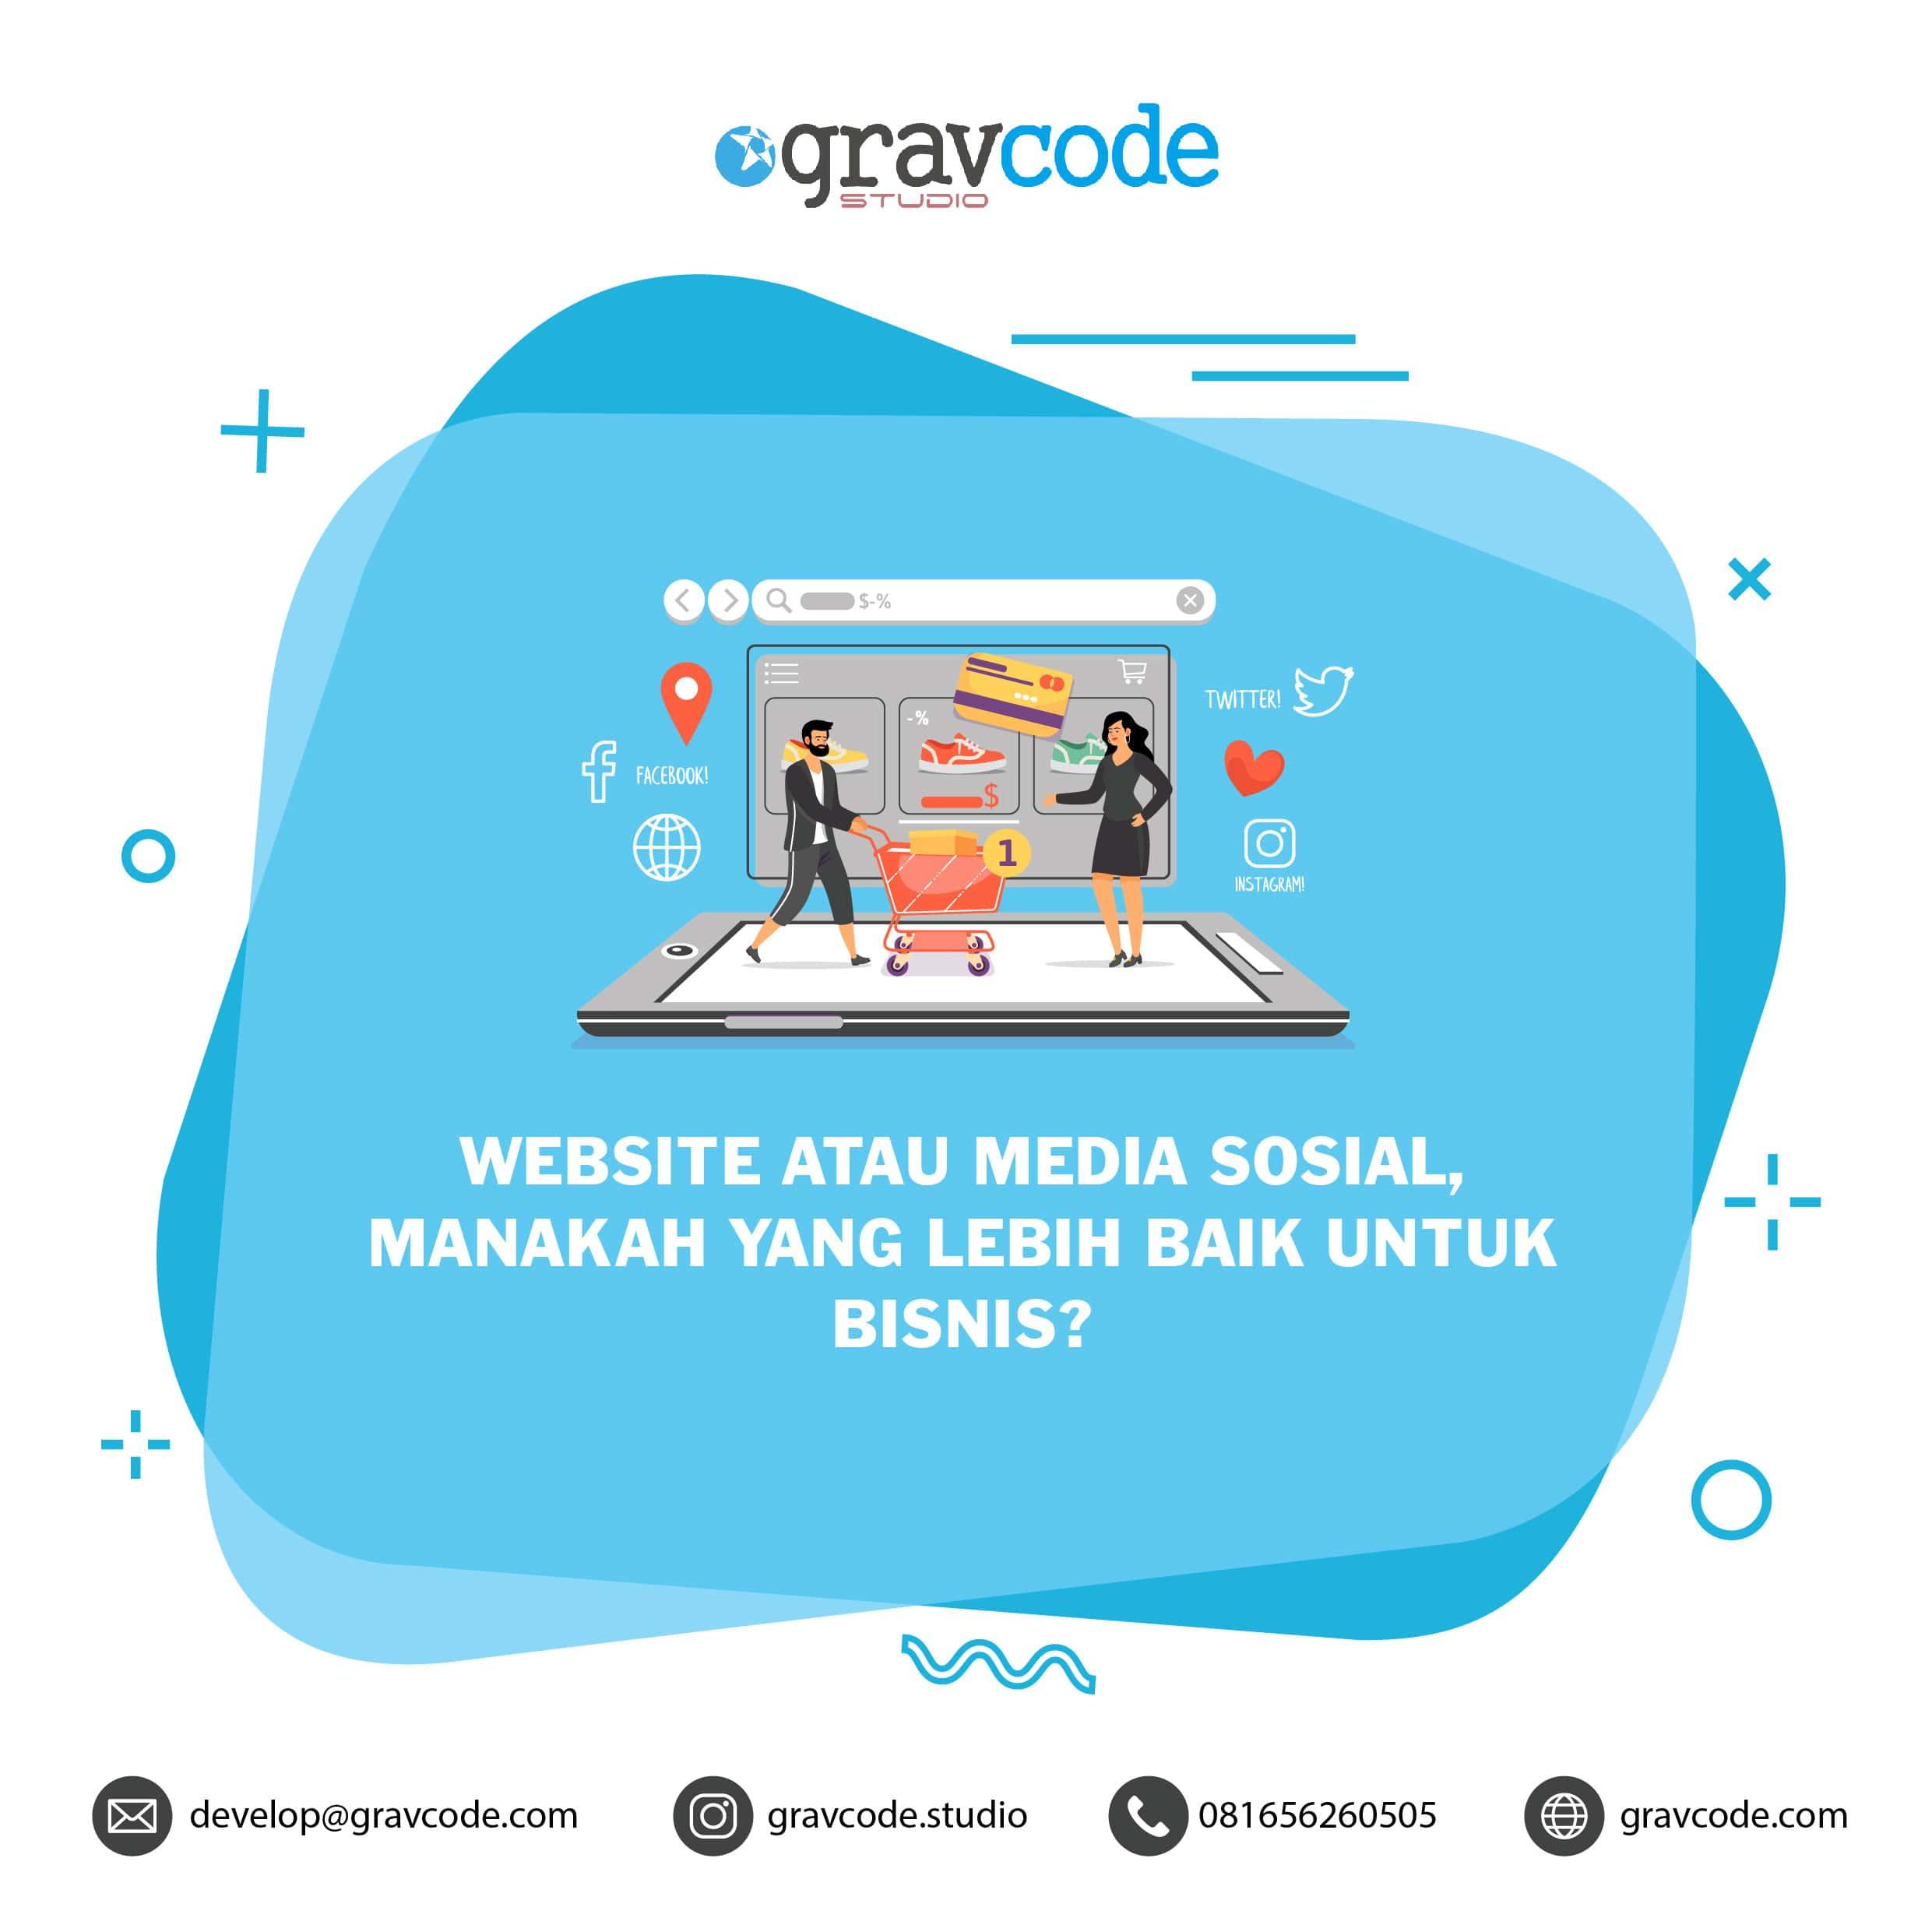 visualisasi website bisnis vs media sosial